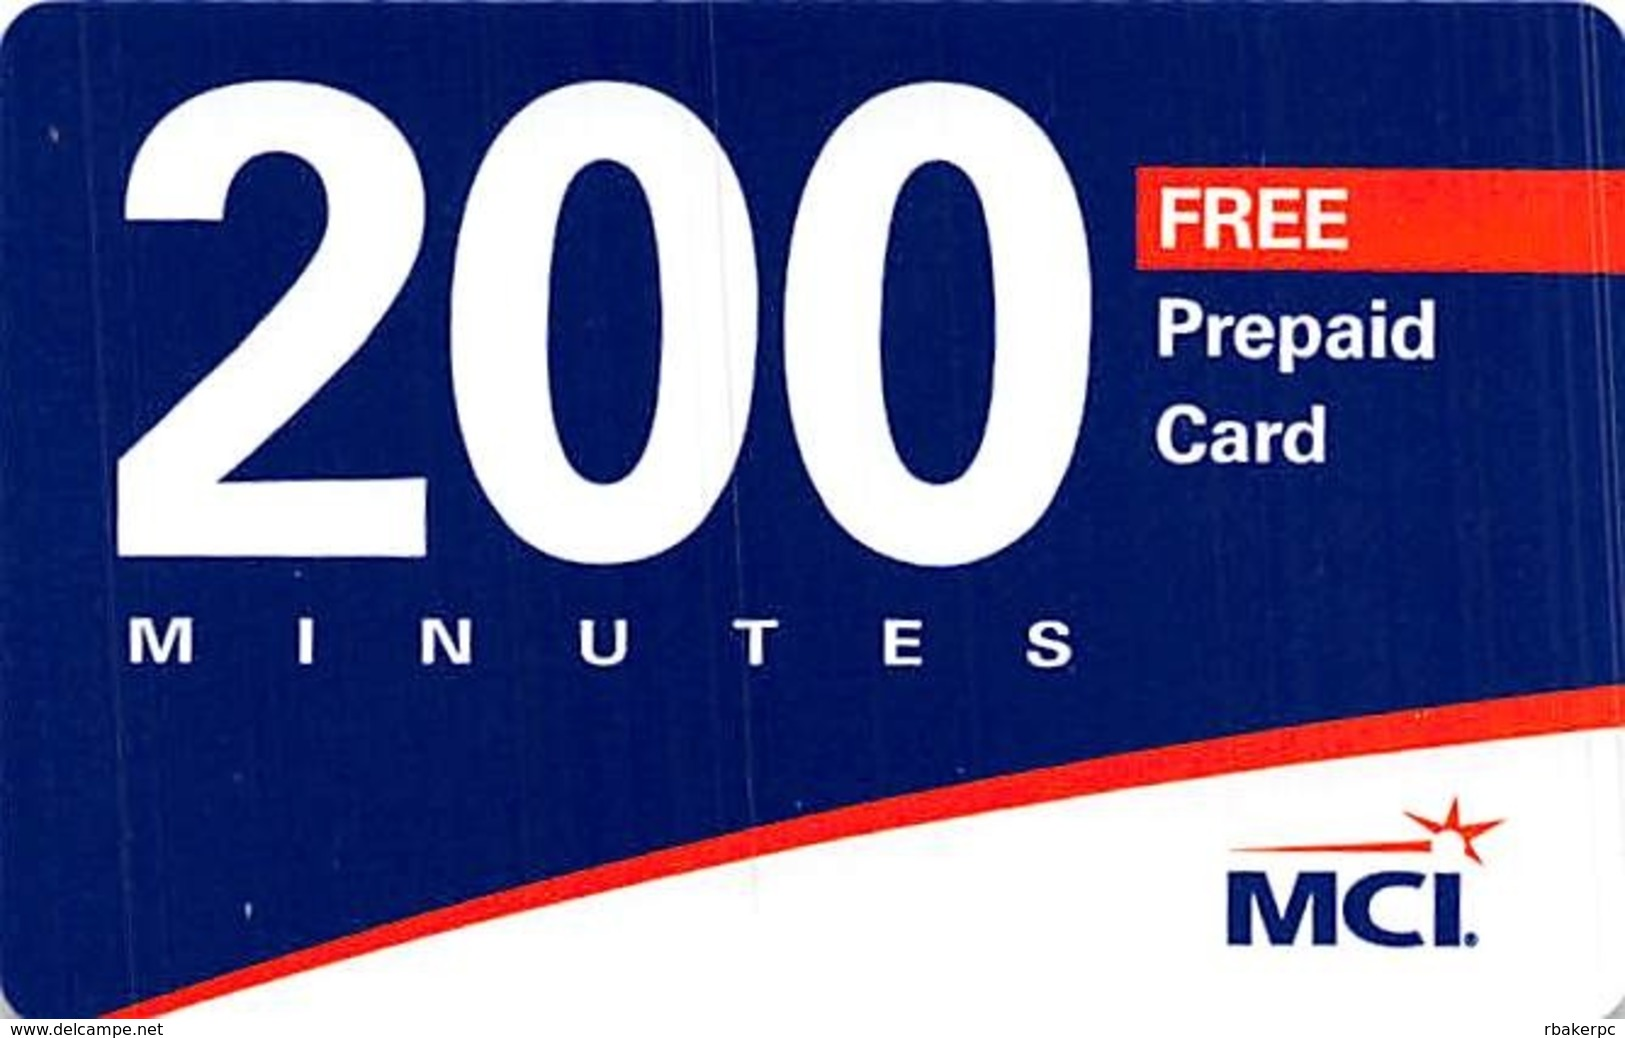 MCI 200 Minutes Free Prepaid Card / Phone Card - Phonecards